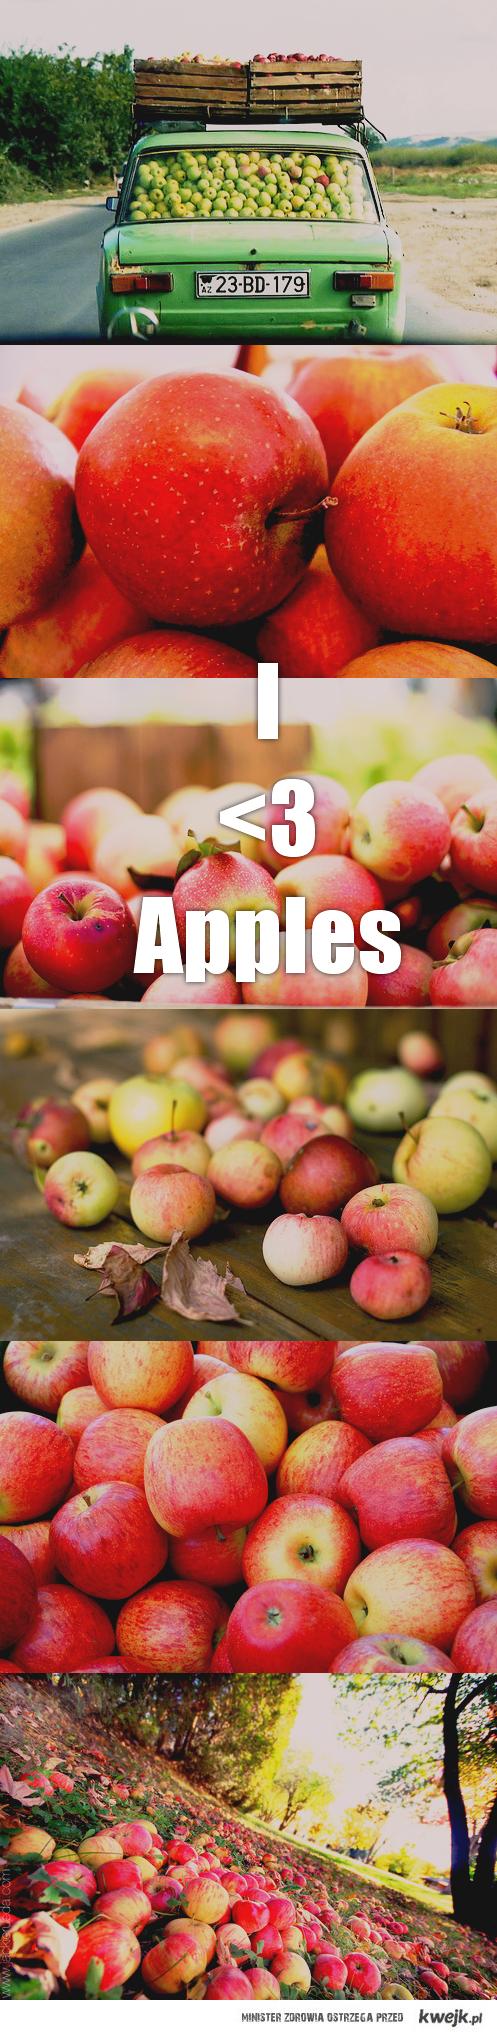 I <3 apples